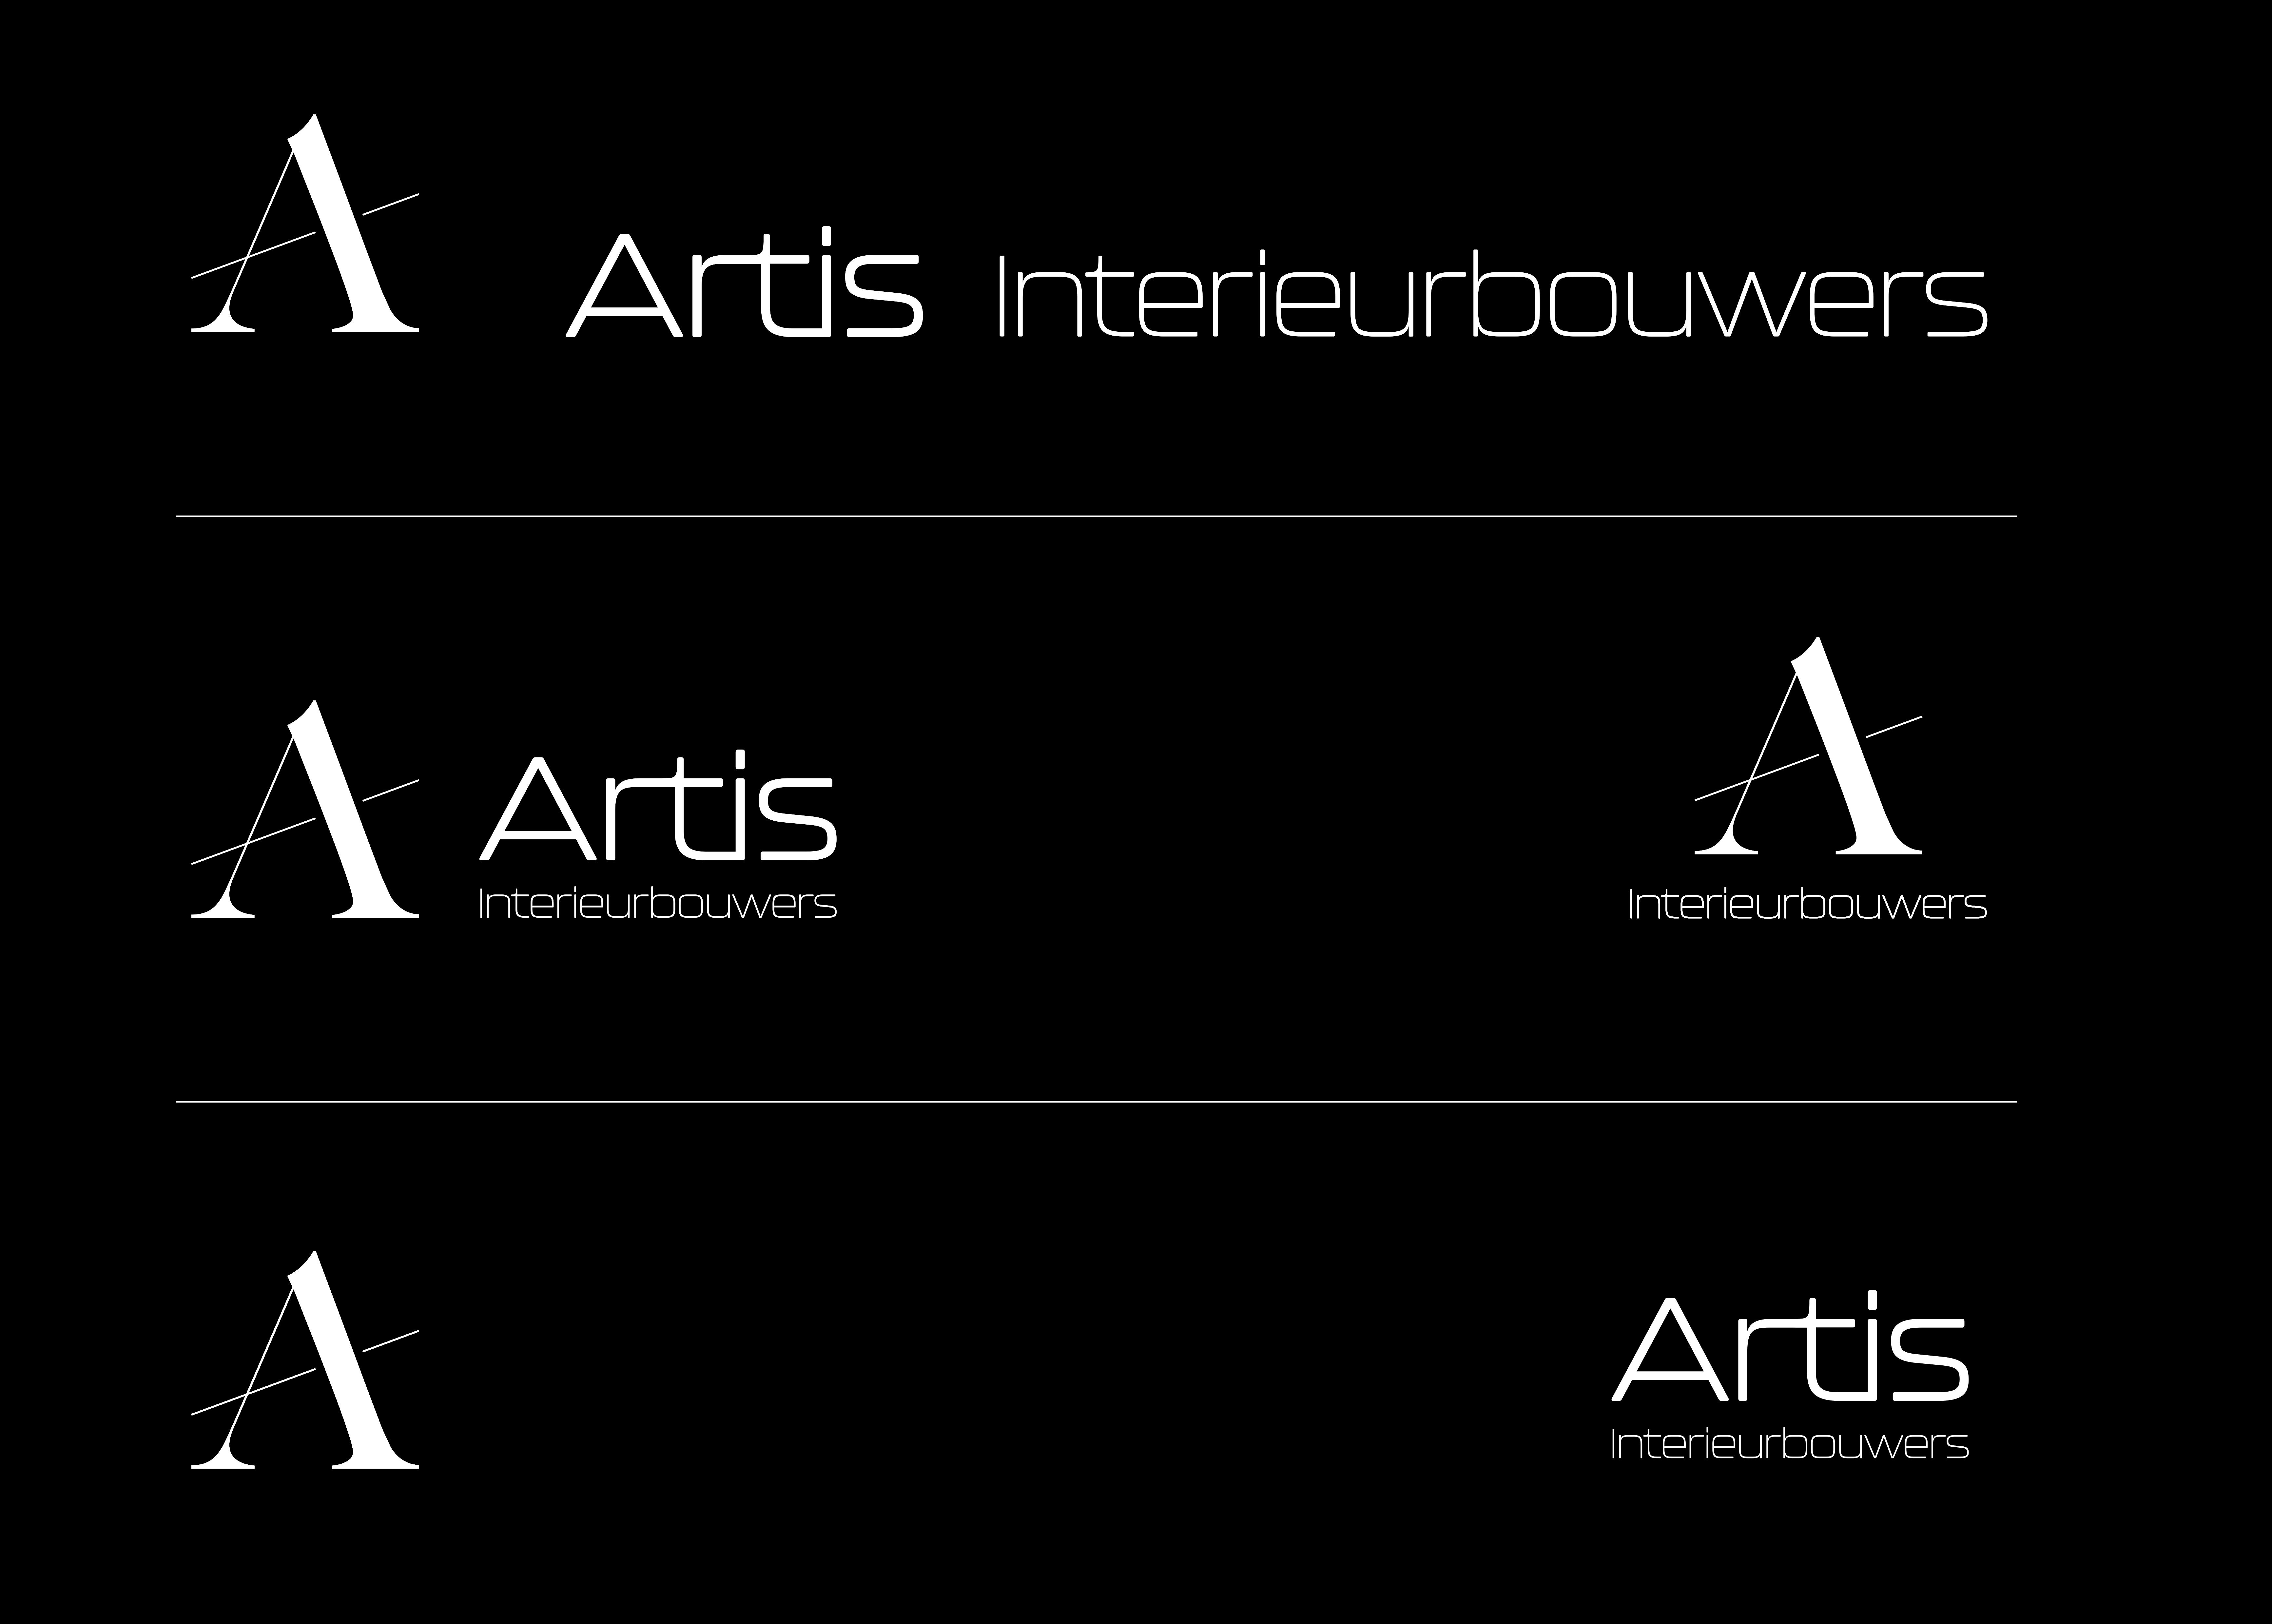 Branding artis interieurbouwers